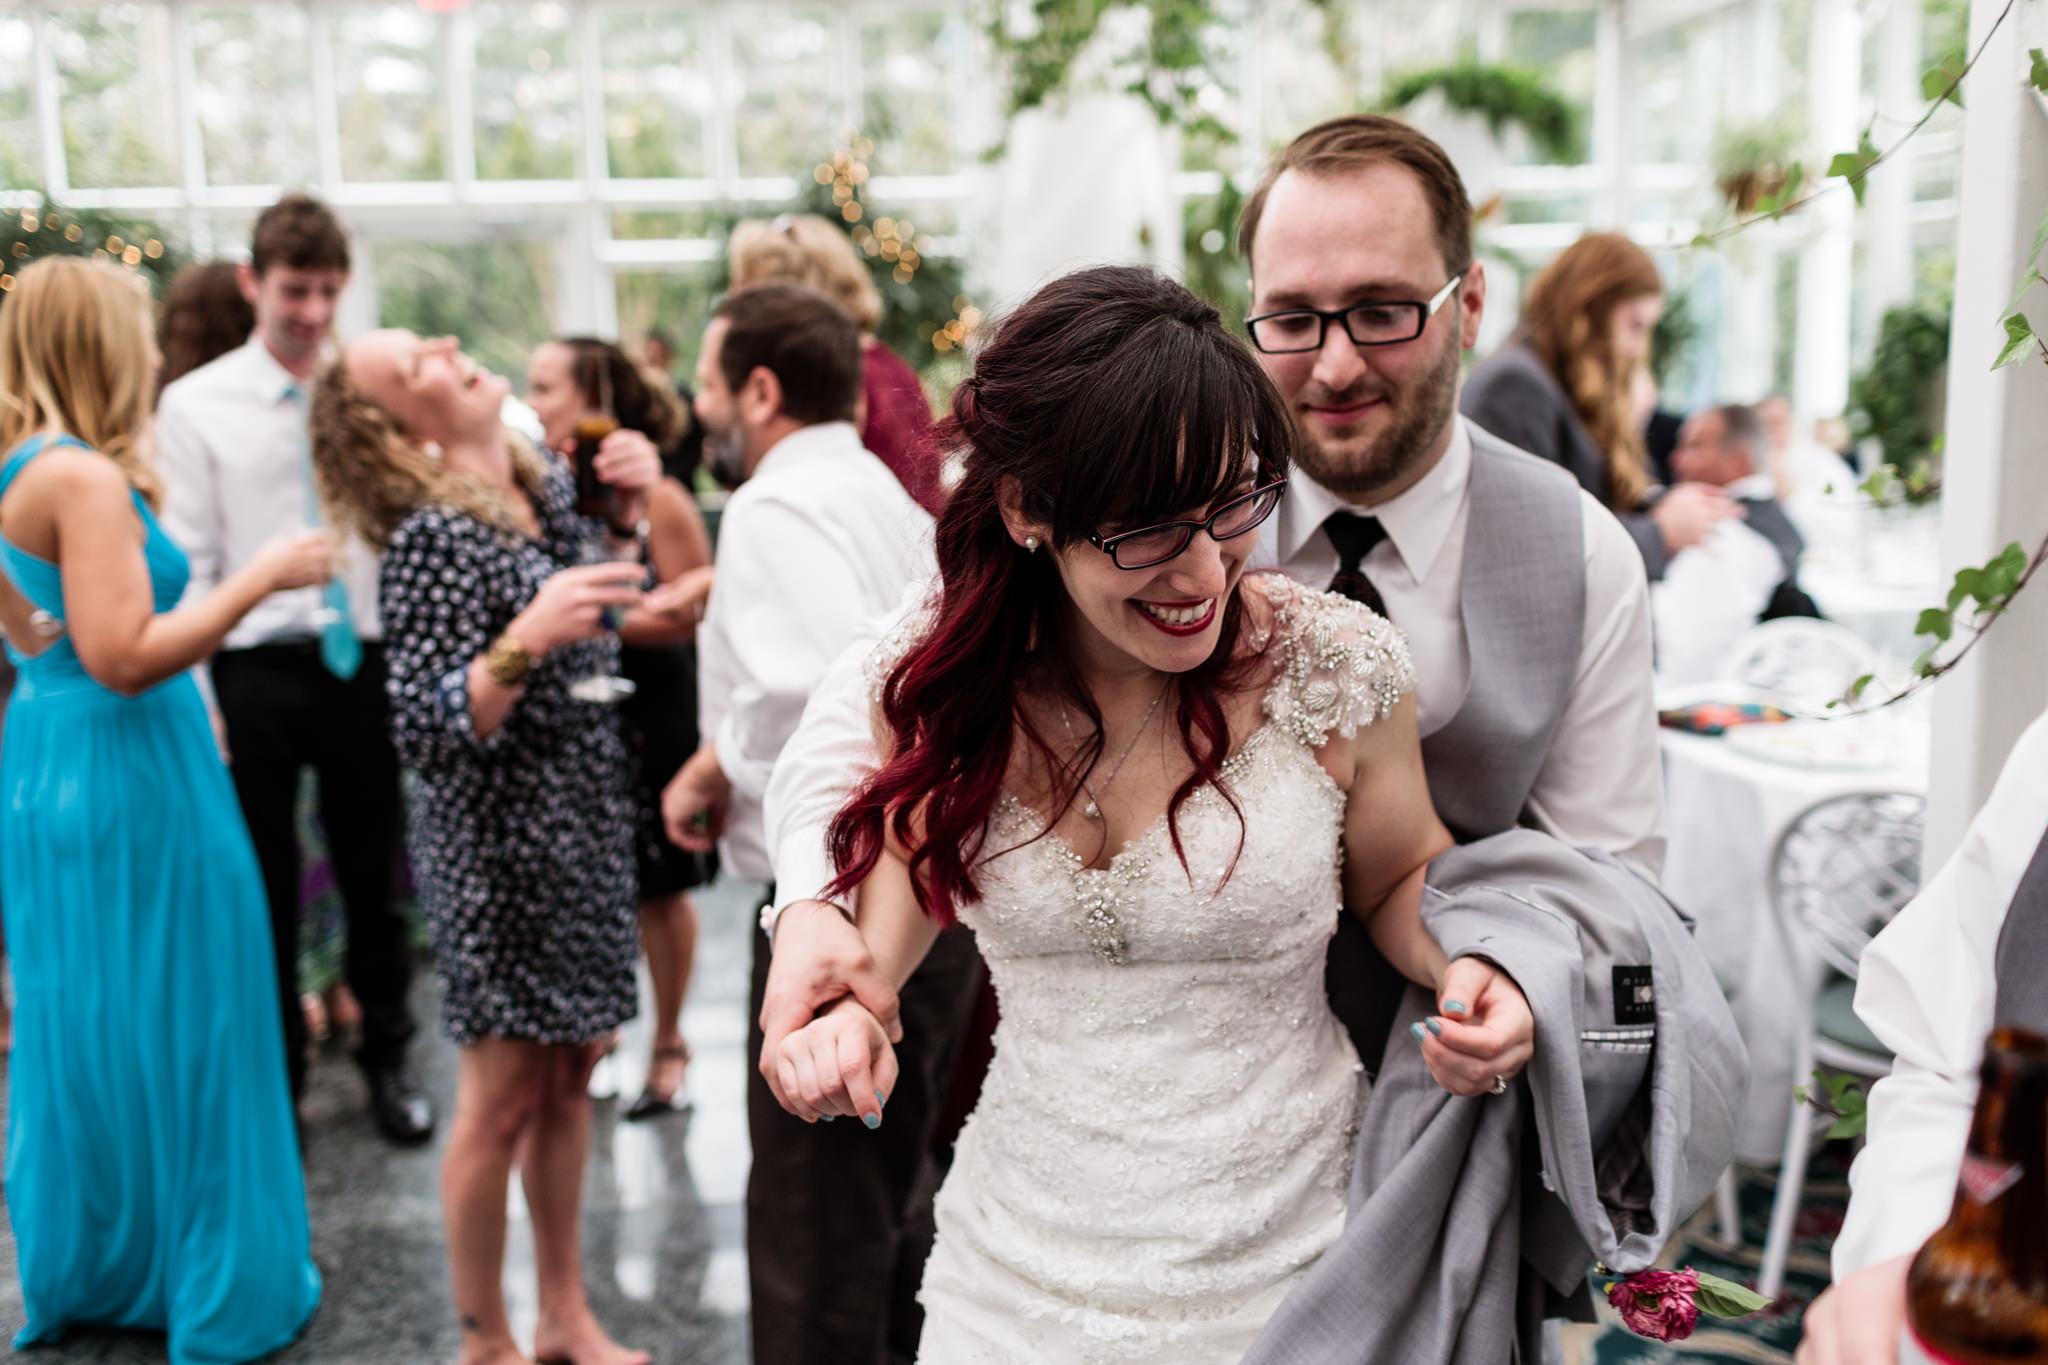 Hanchar_Madison_Hotel_NJ_Wedding_7R5A8994.jpg